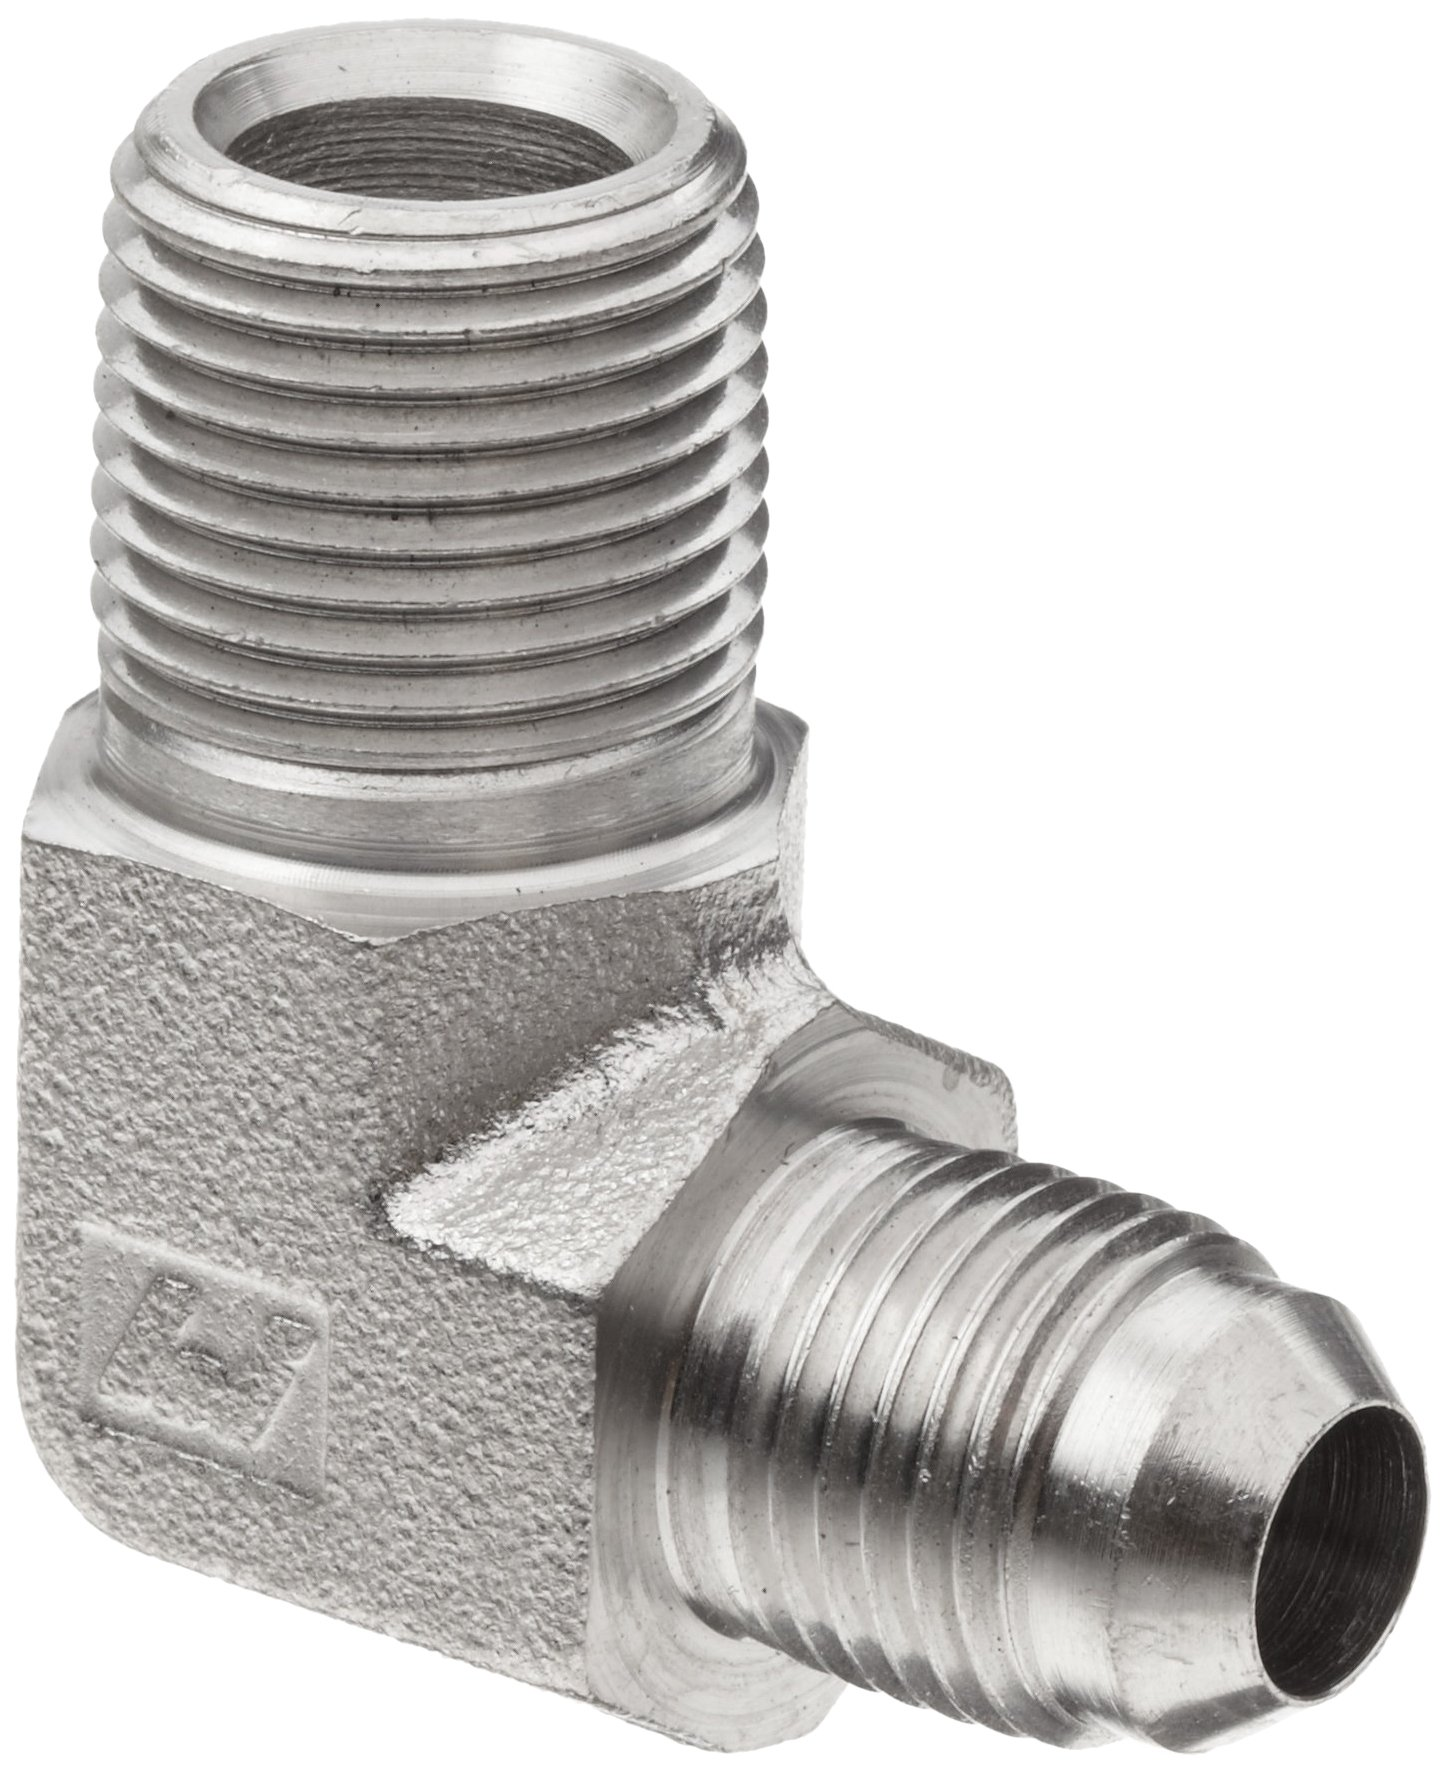 Brennan 2501-06-08-SS, Stainless Steel JIC Tube Fitting, 06MJ-08MP 90 Degree Elbow, 3/8'' Tube OD x 1/2''-14 NPTF Male